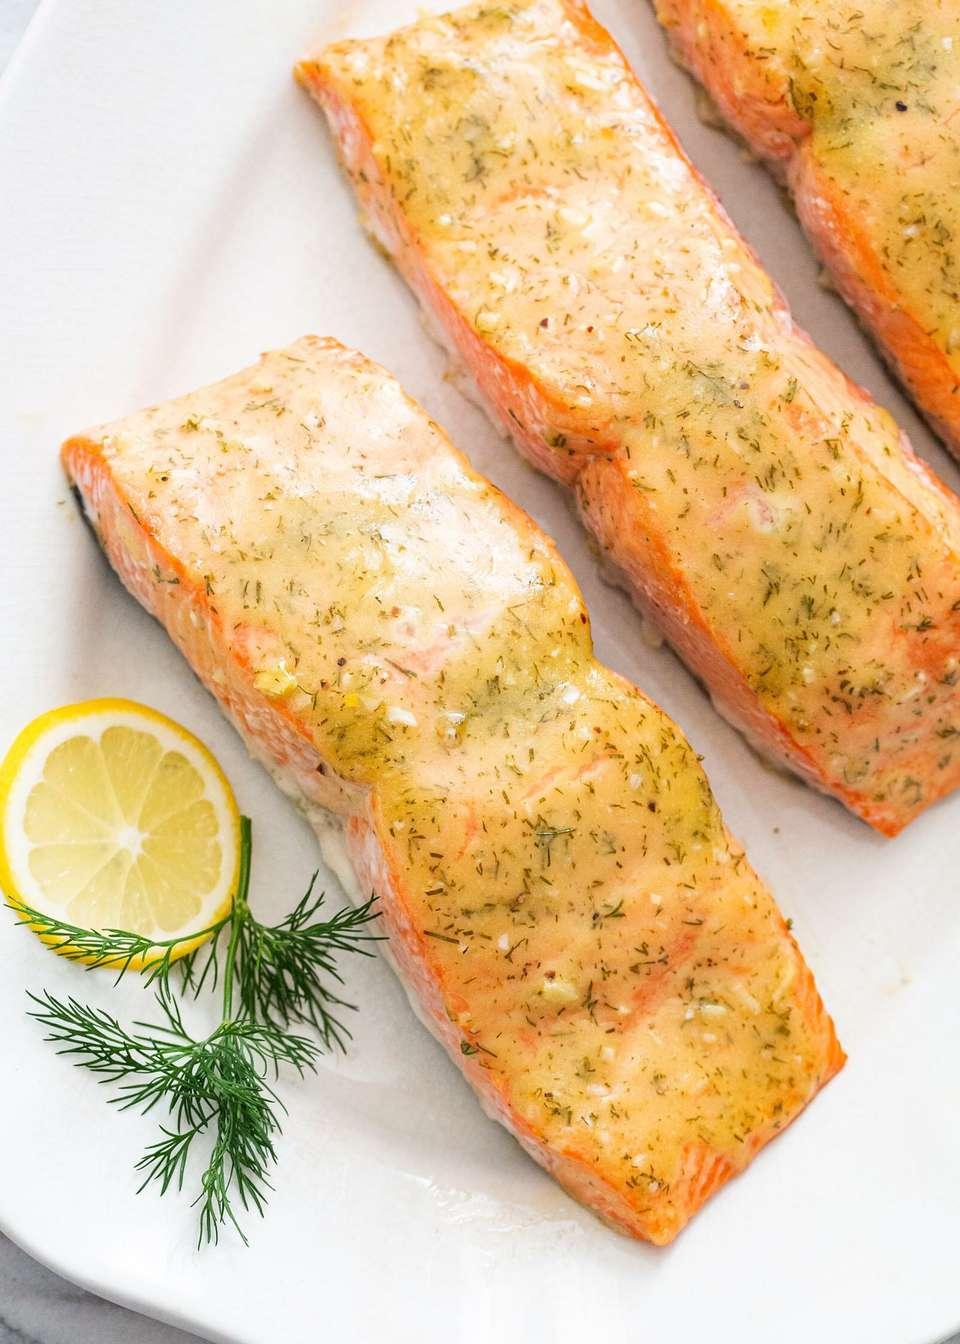 Baked honey mustard salmon on a platter with lemon garnish.